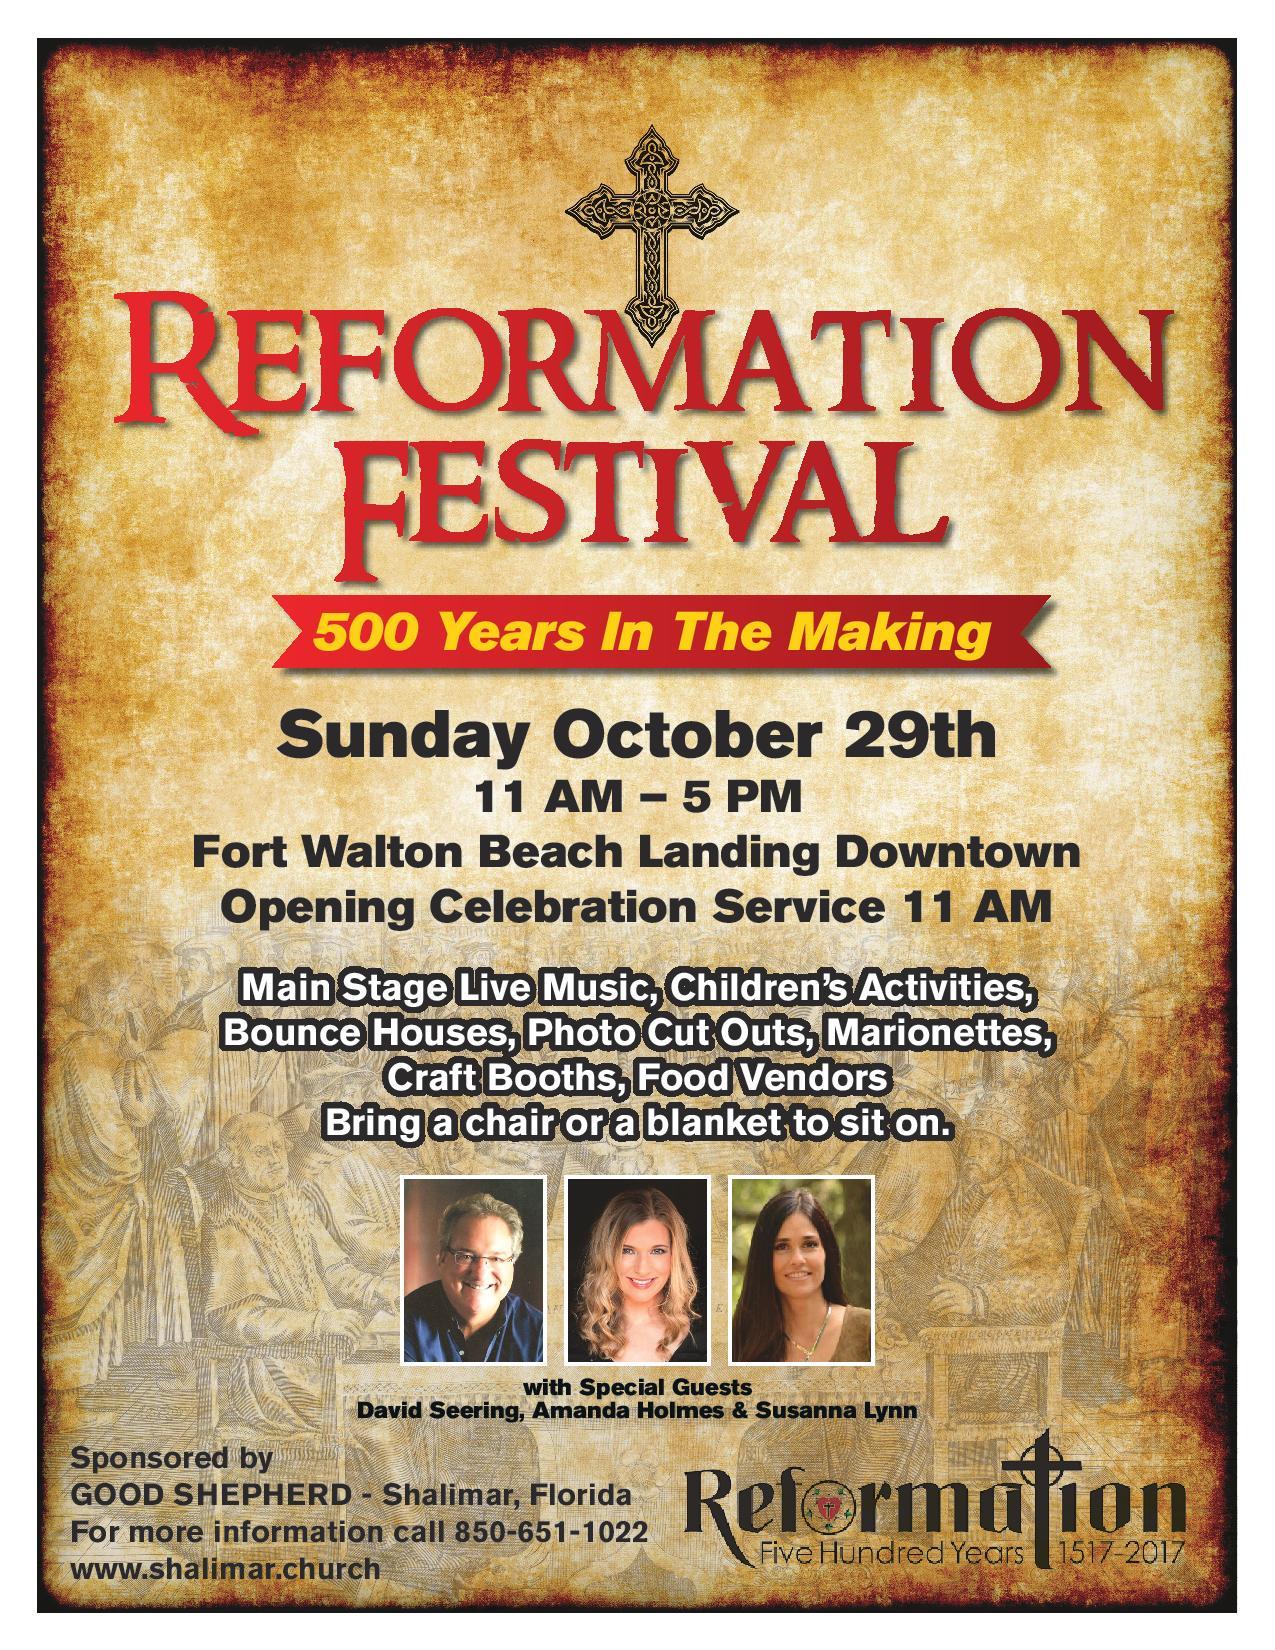 Reformation Festival Flyer 102917.jpg